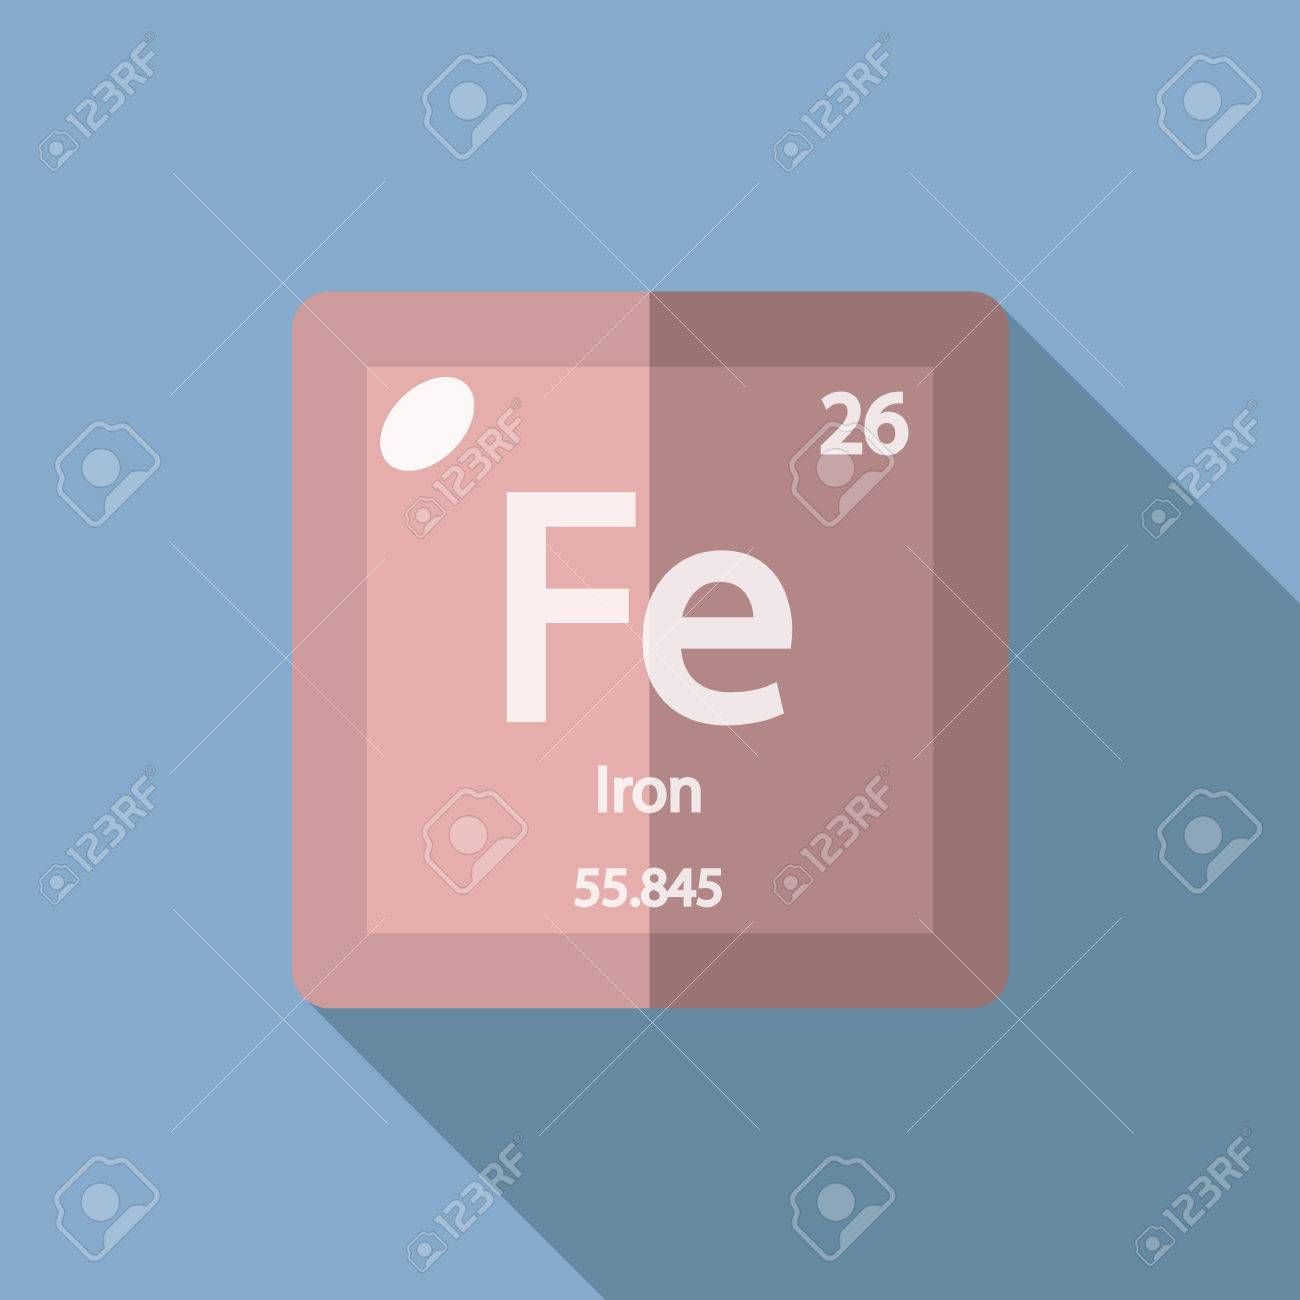 Chemical Element Iron Flat Design Style Modern Vector Illustration